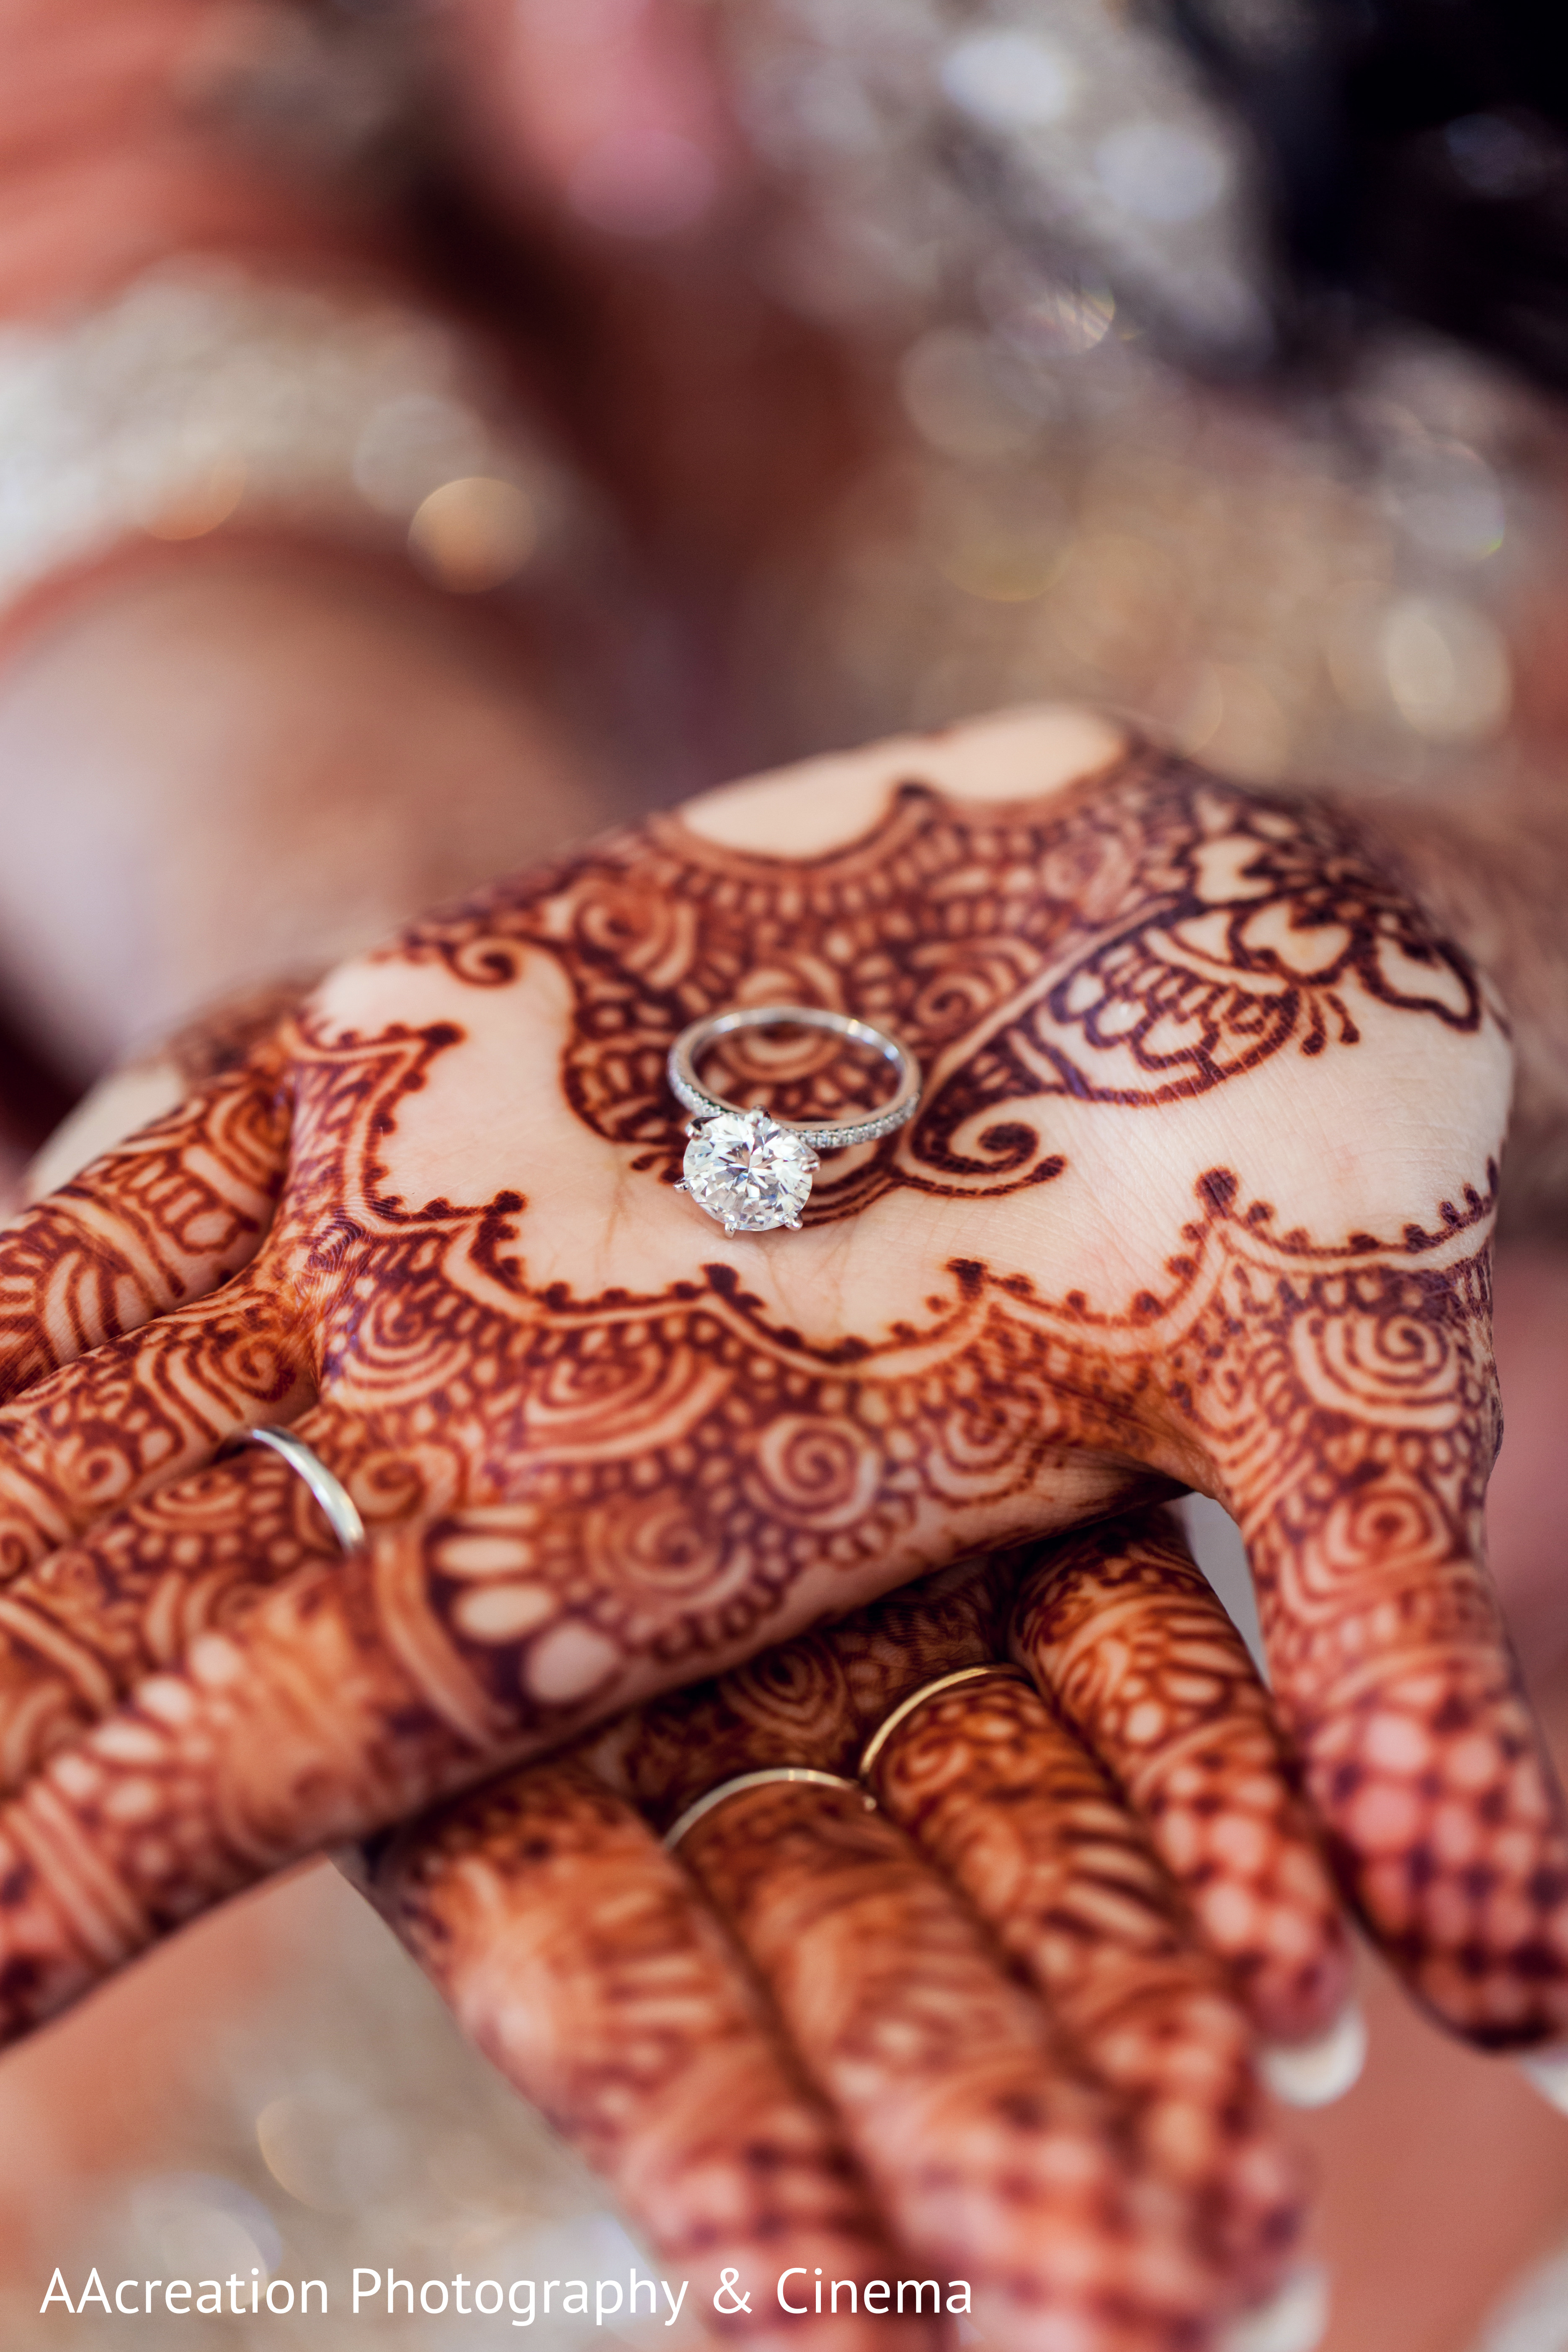 Mehndi Hands With Engagement Ring : Bridal jewelry mehndi in cerritos ca pakistani wedding